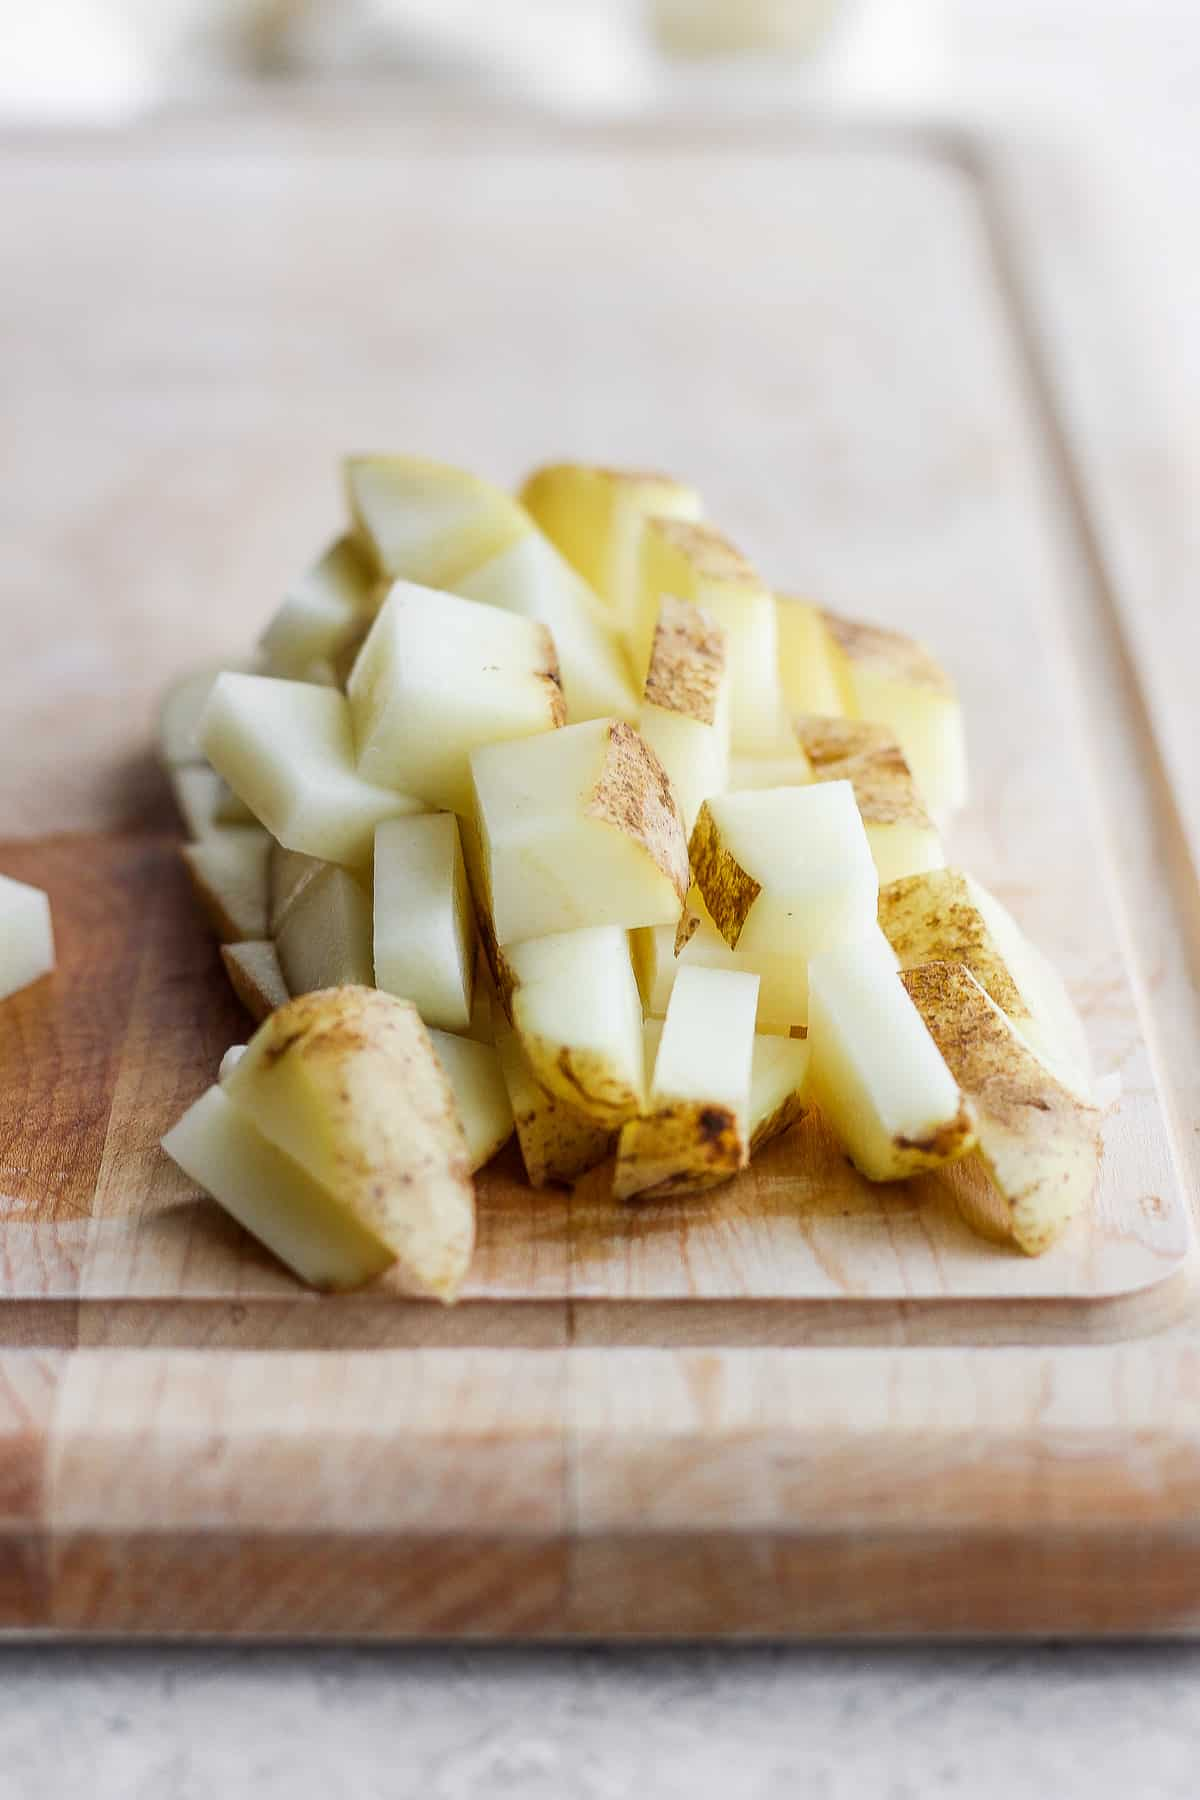 Cubed potatoes cut on a cutting board